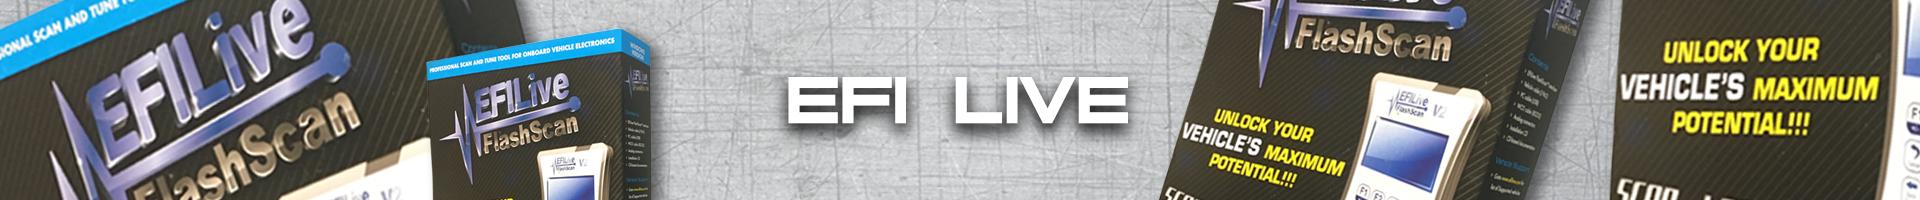 EFI LIVE | Defeo